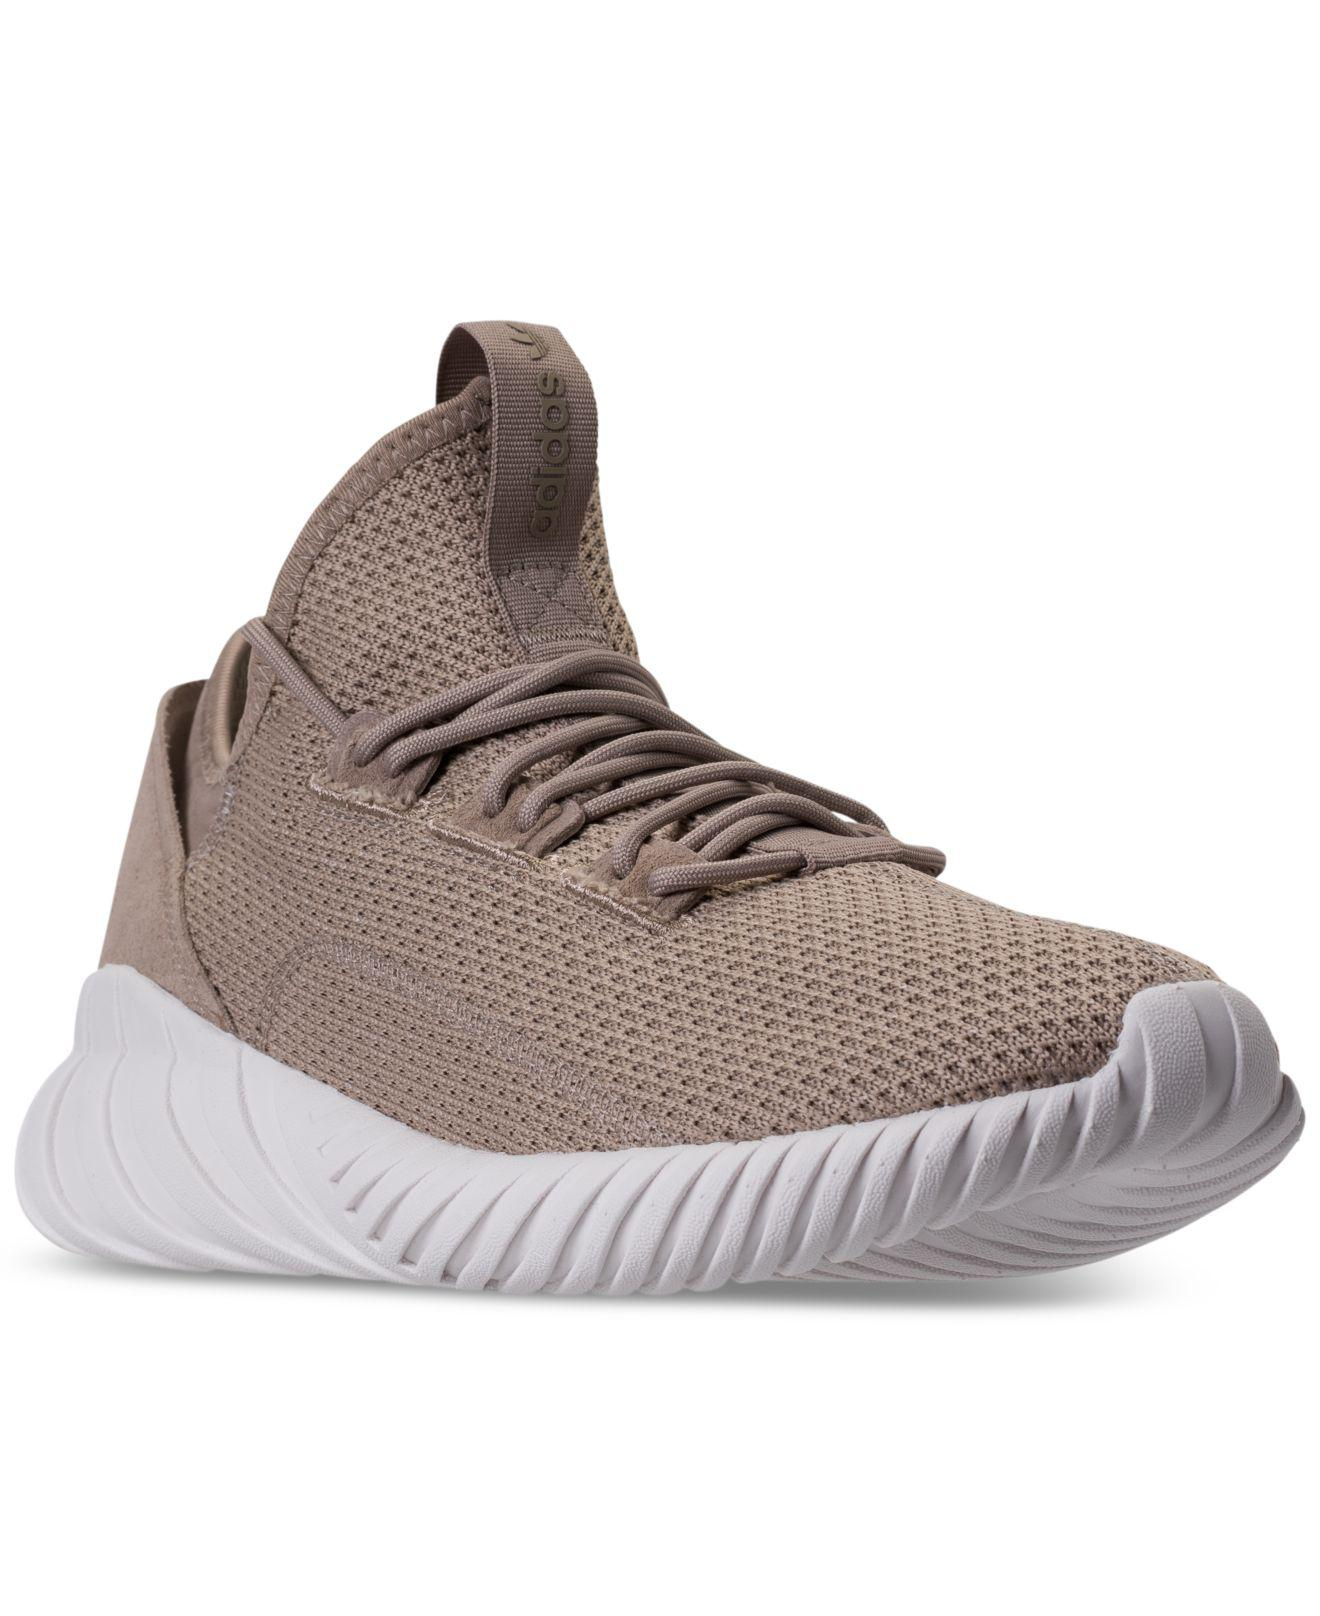 lyst adidas uomini doom sock primeknit casual scarpe da tubuli